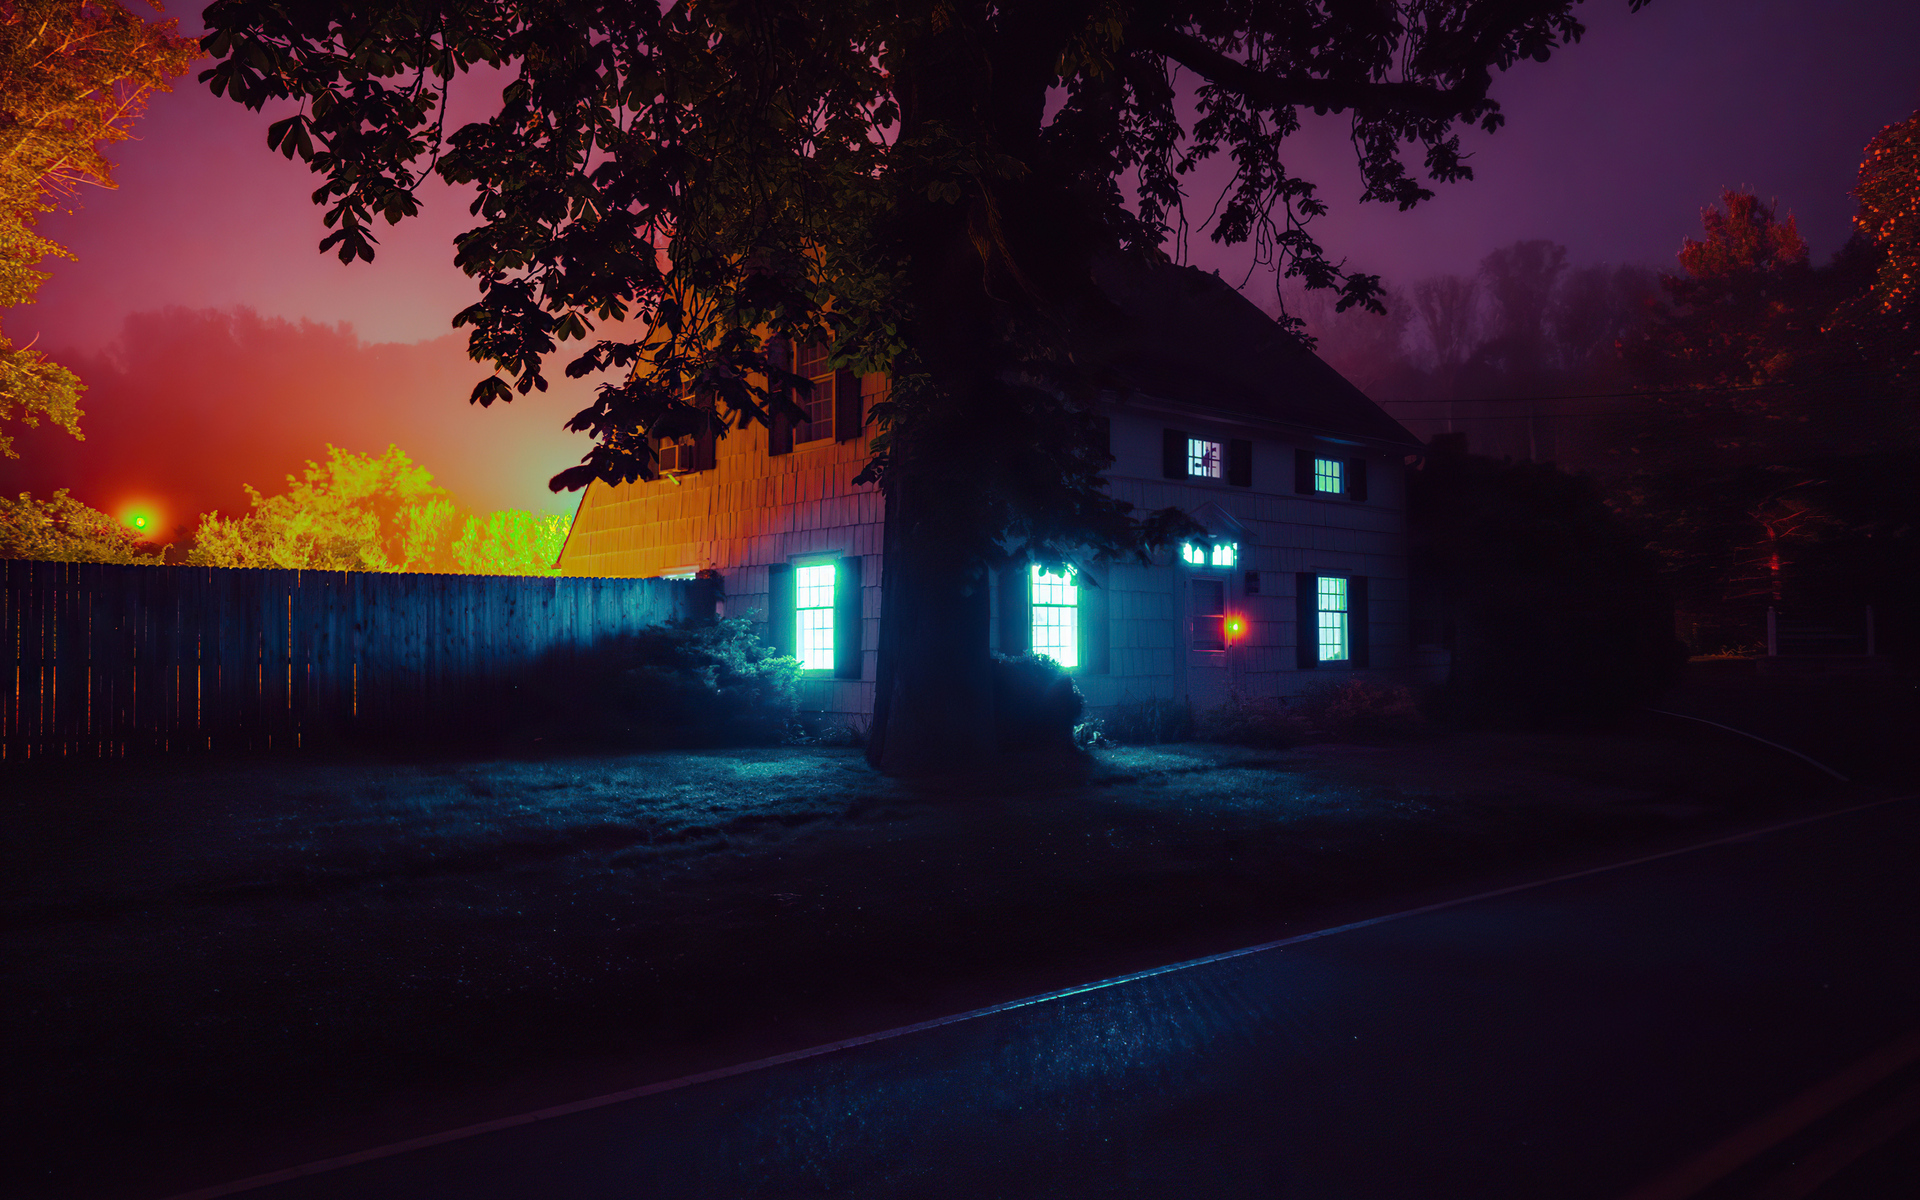 house-night-lights-4k-qk.jpg